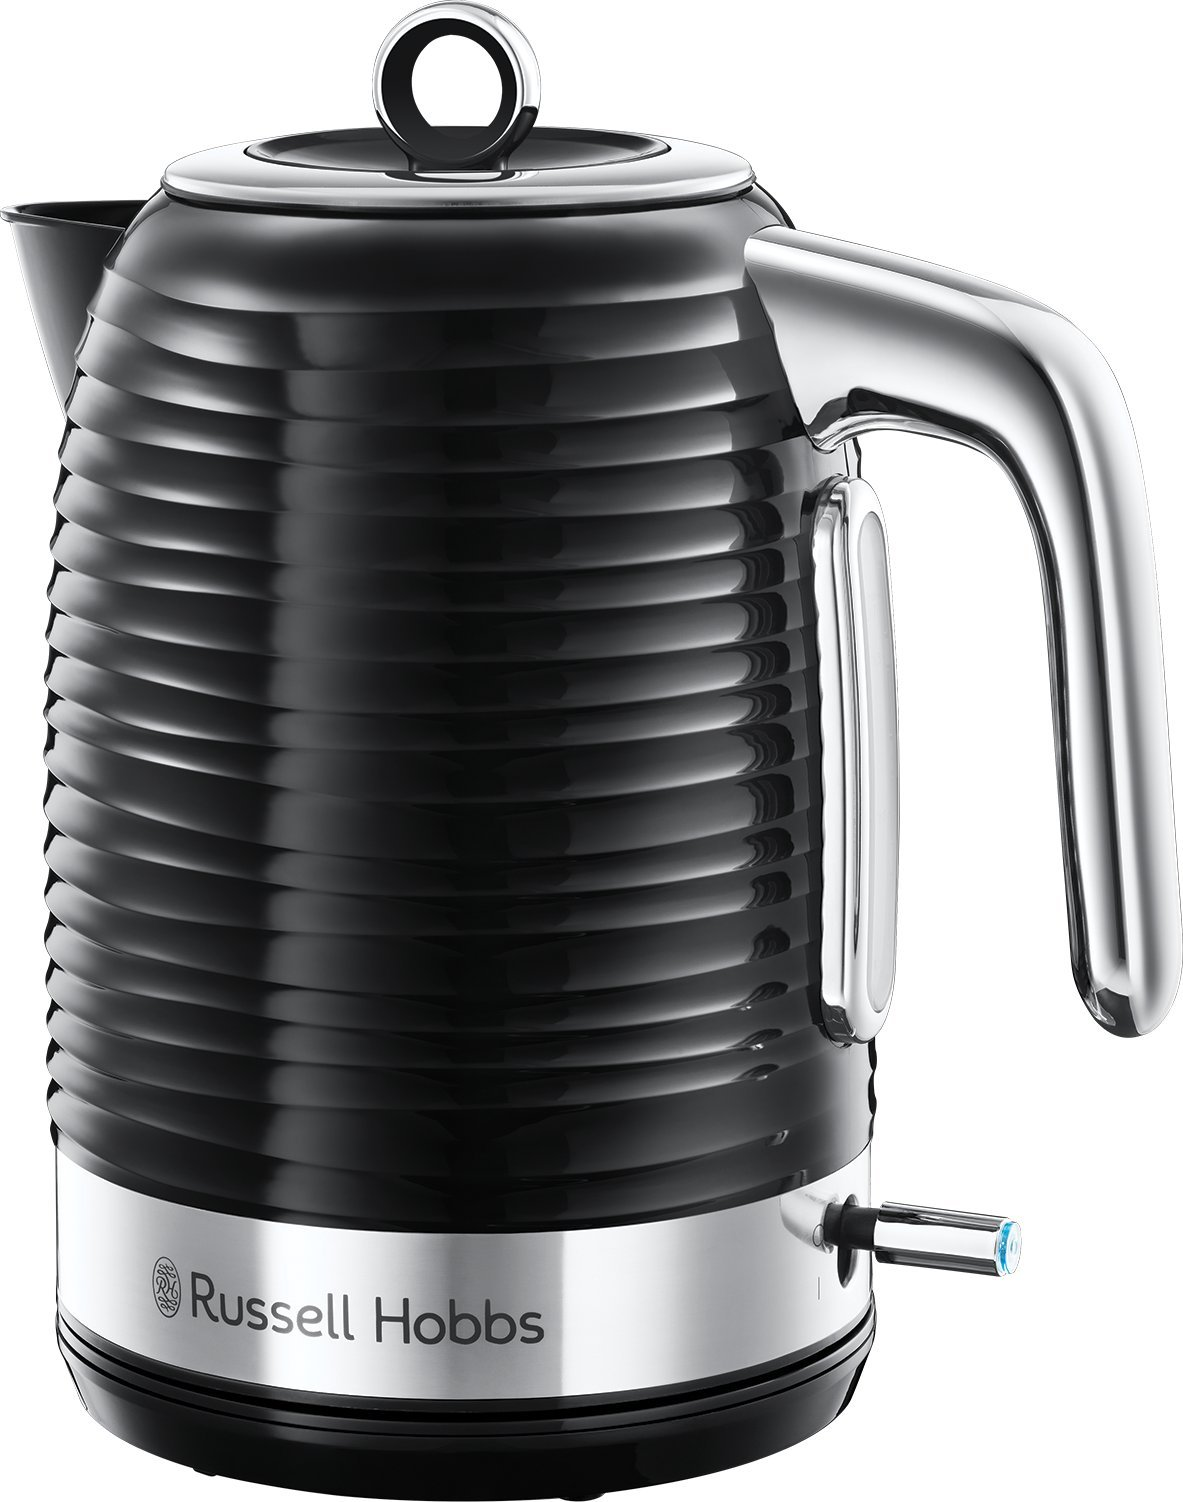 Black Russell Hobbs 24361 Inspire Kettle Limescale Filter Rapid Boil 1.7L 3kW